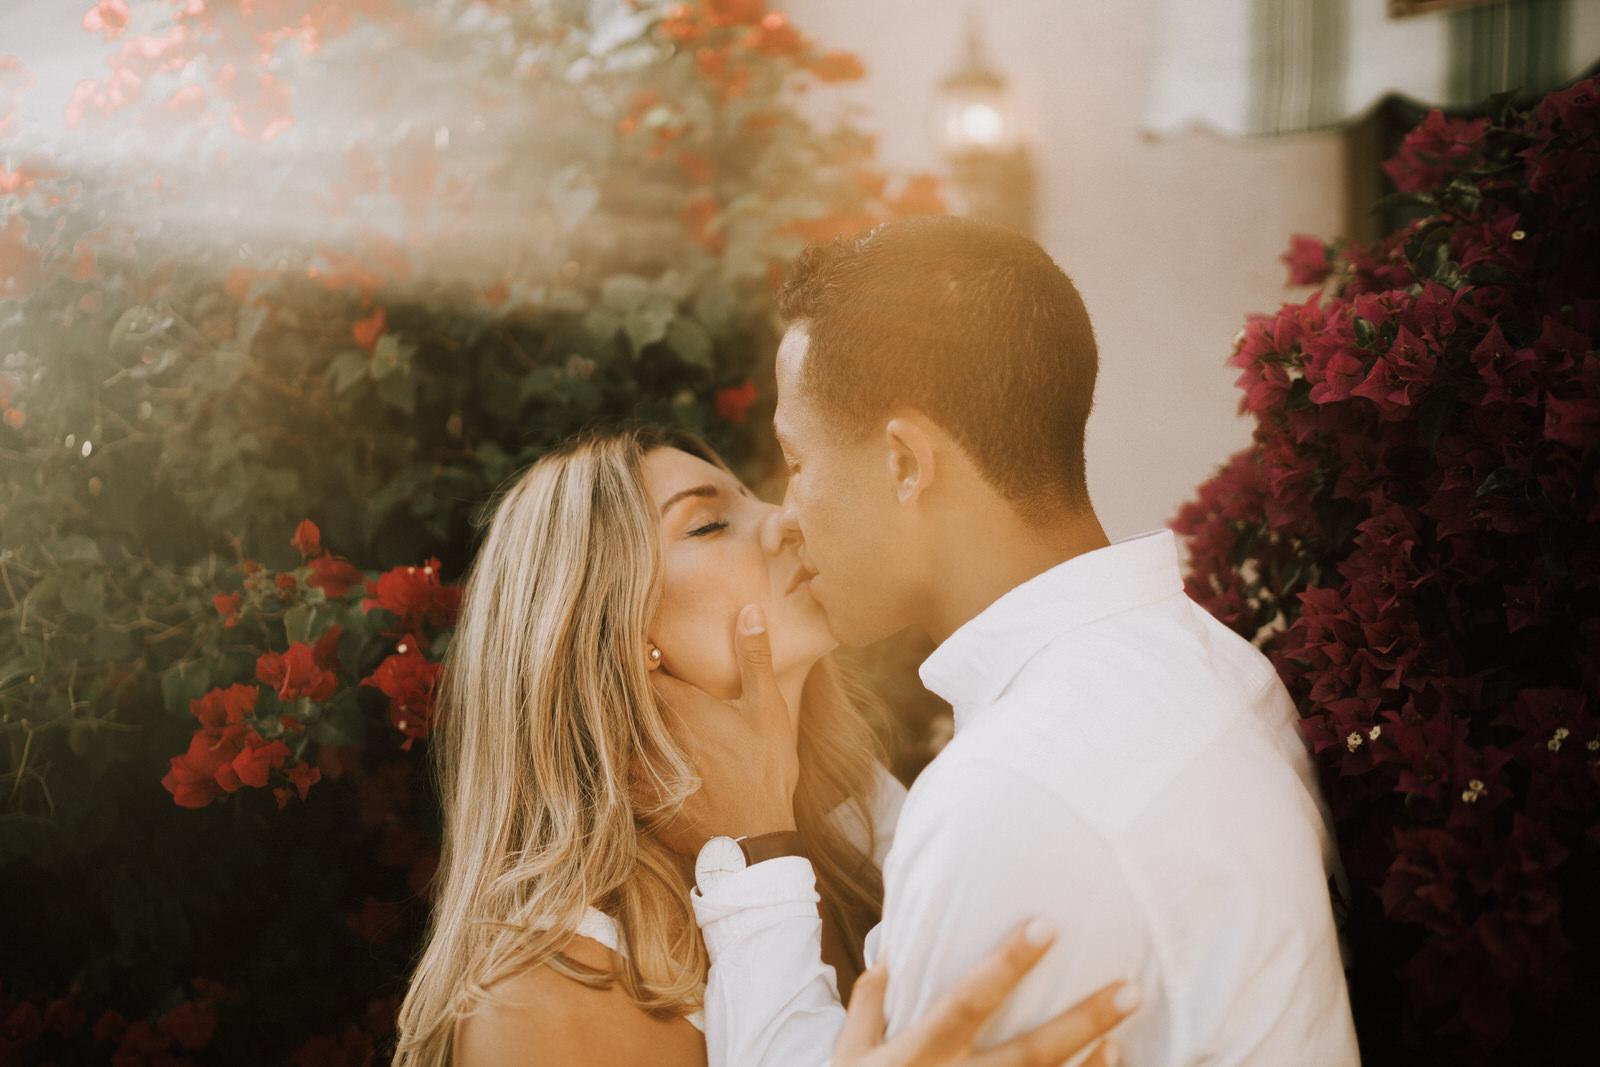 Naples 5th Ave Engagement Photos- Michelle Gonzalez Photography- Michele + Troy-163.JPG